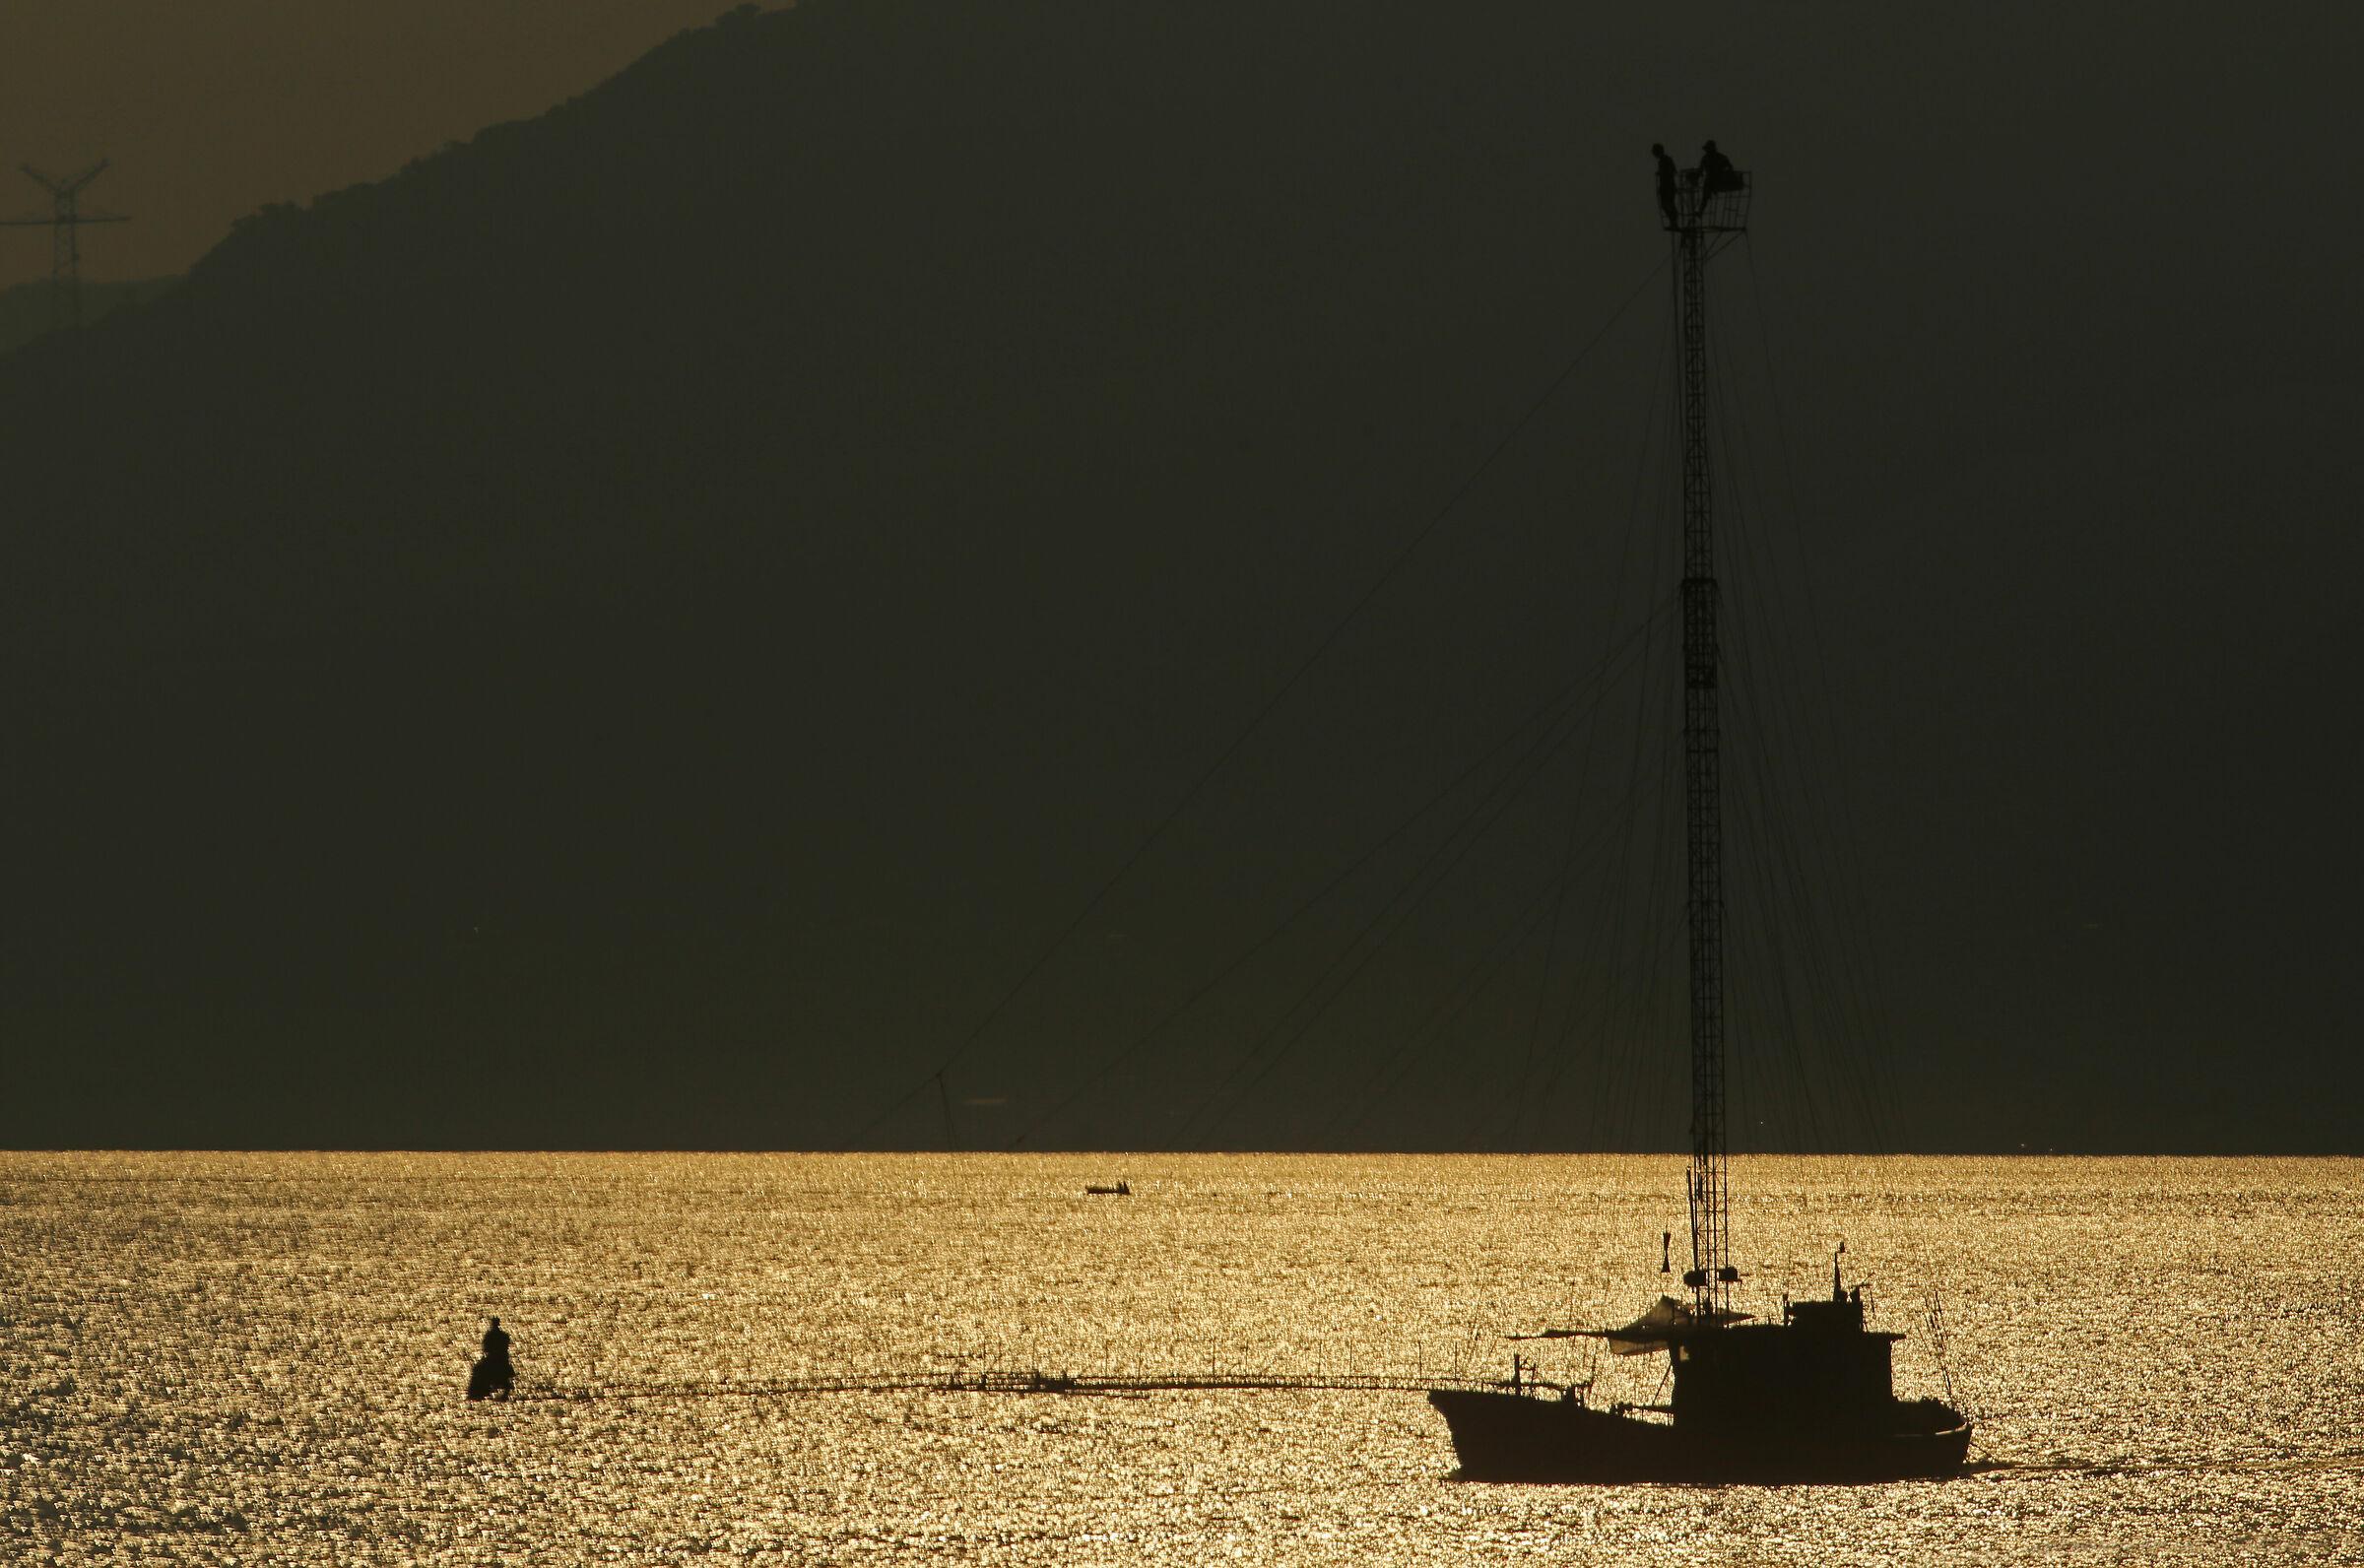 Swordfish fishing on the Strait of Messina 2...